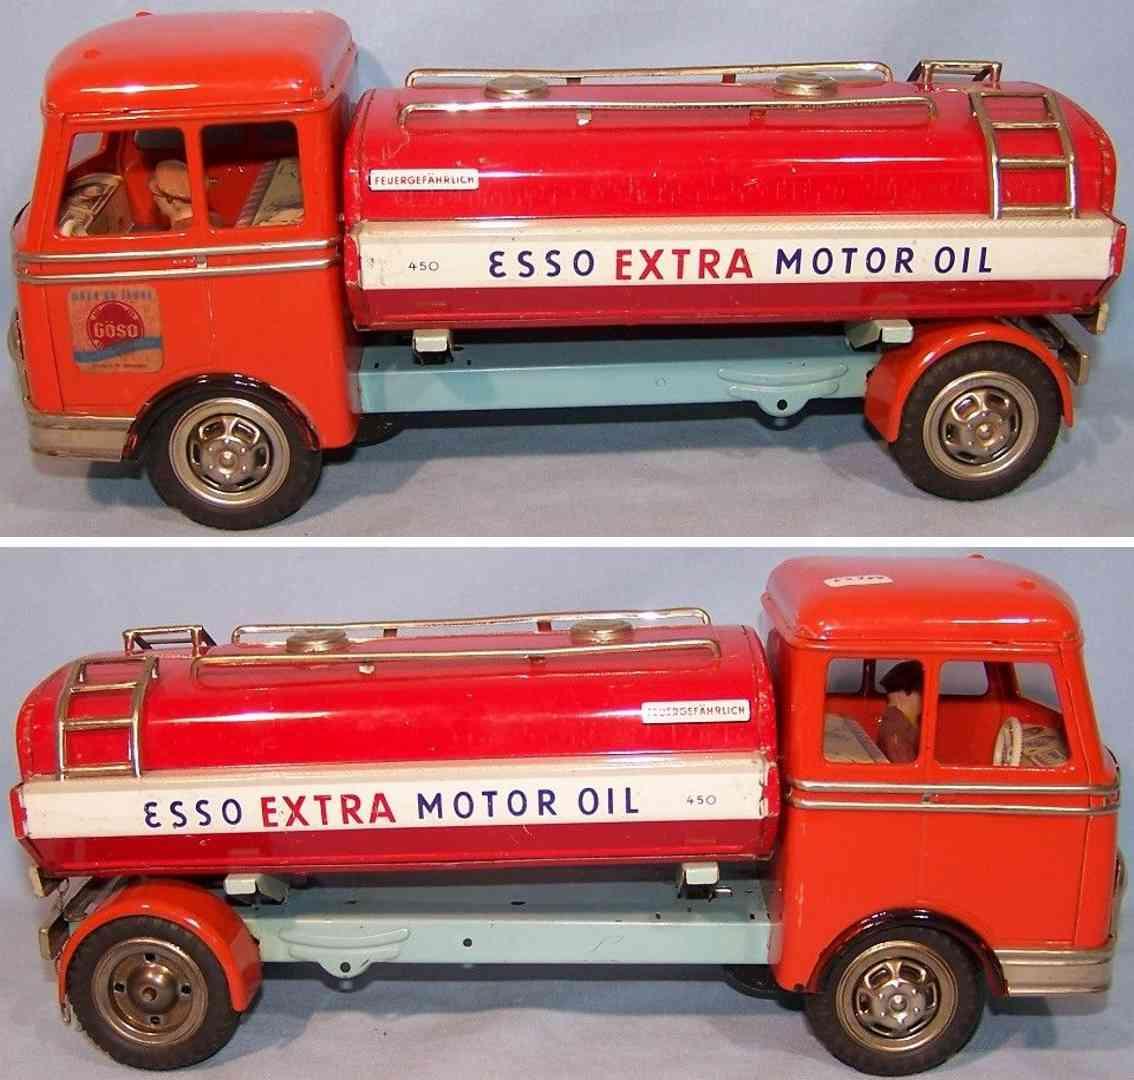 goeso 450 blech spielzeug esso tanklastwagen orange rot fahrer